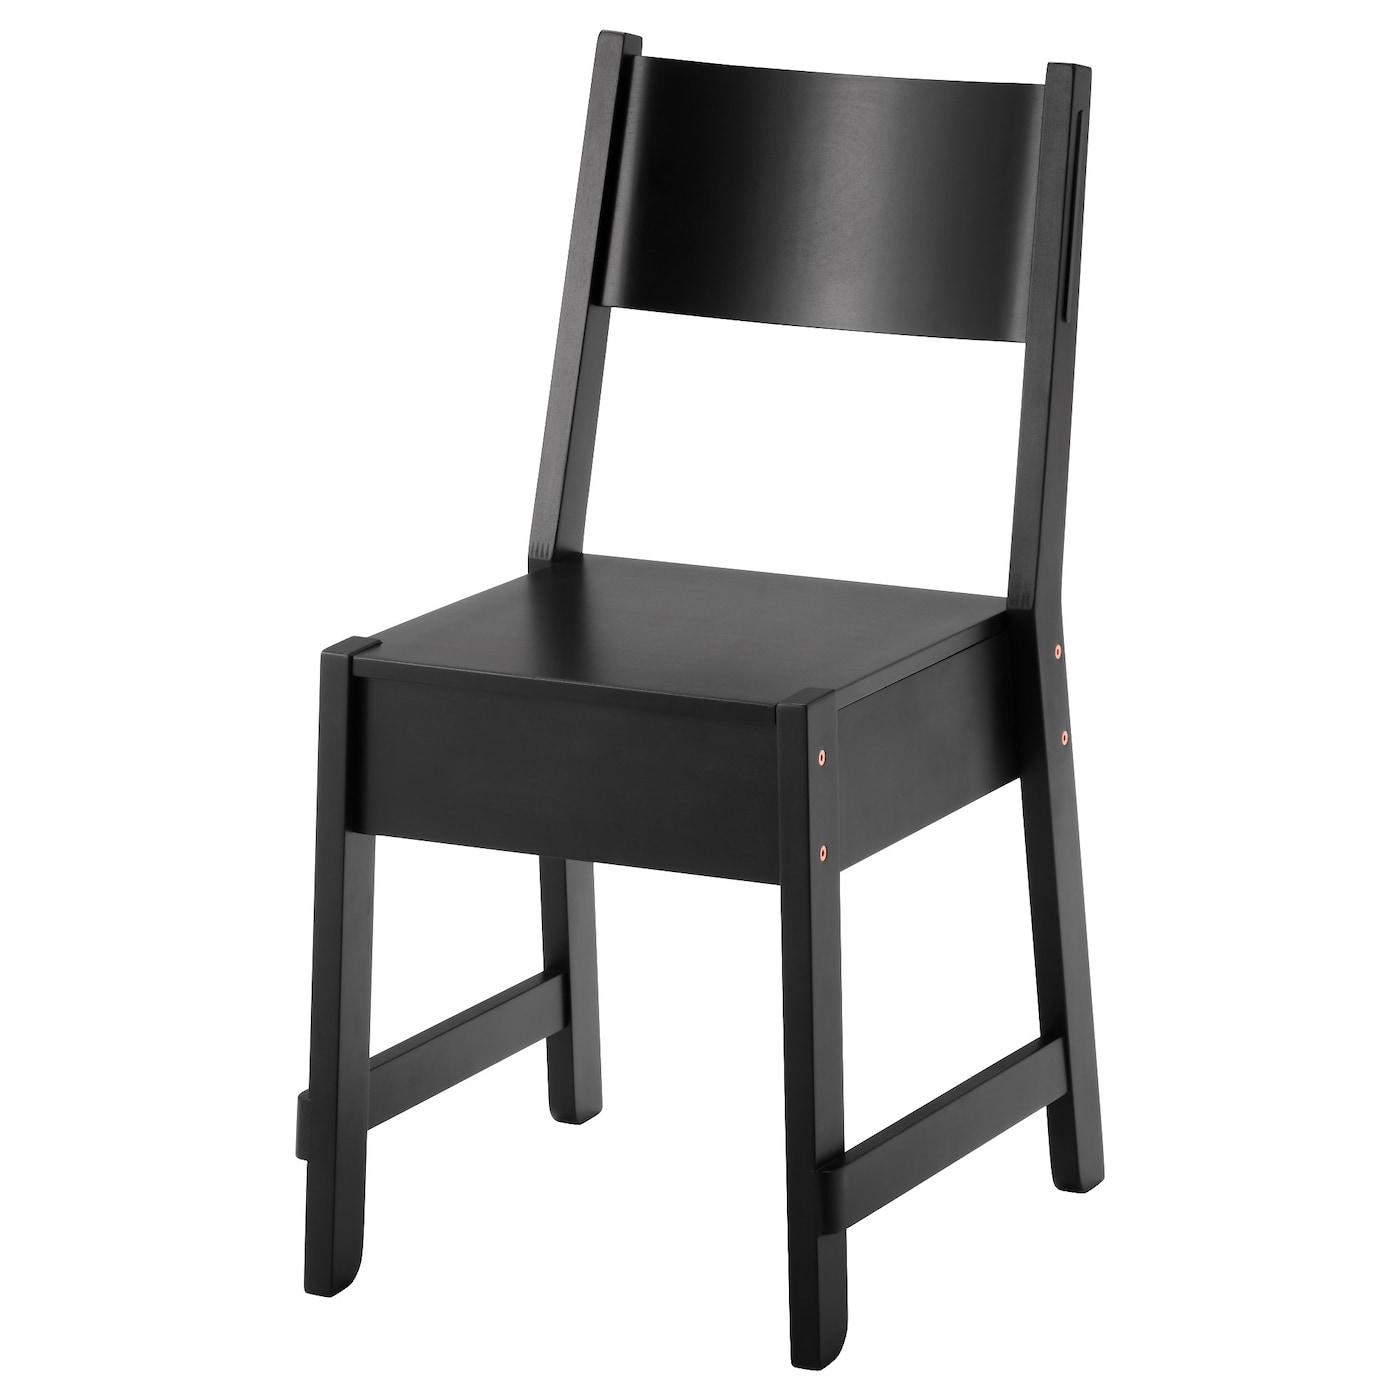 norr ker chaise blanc bouleau ikea. Black Bedroom Furniture Sets. Home Design Ideas